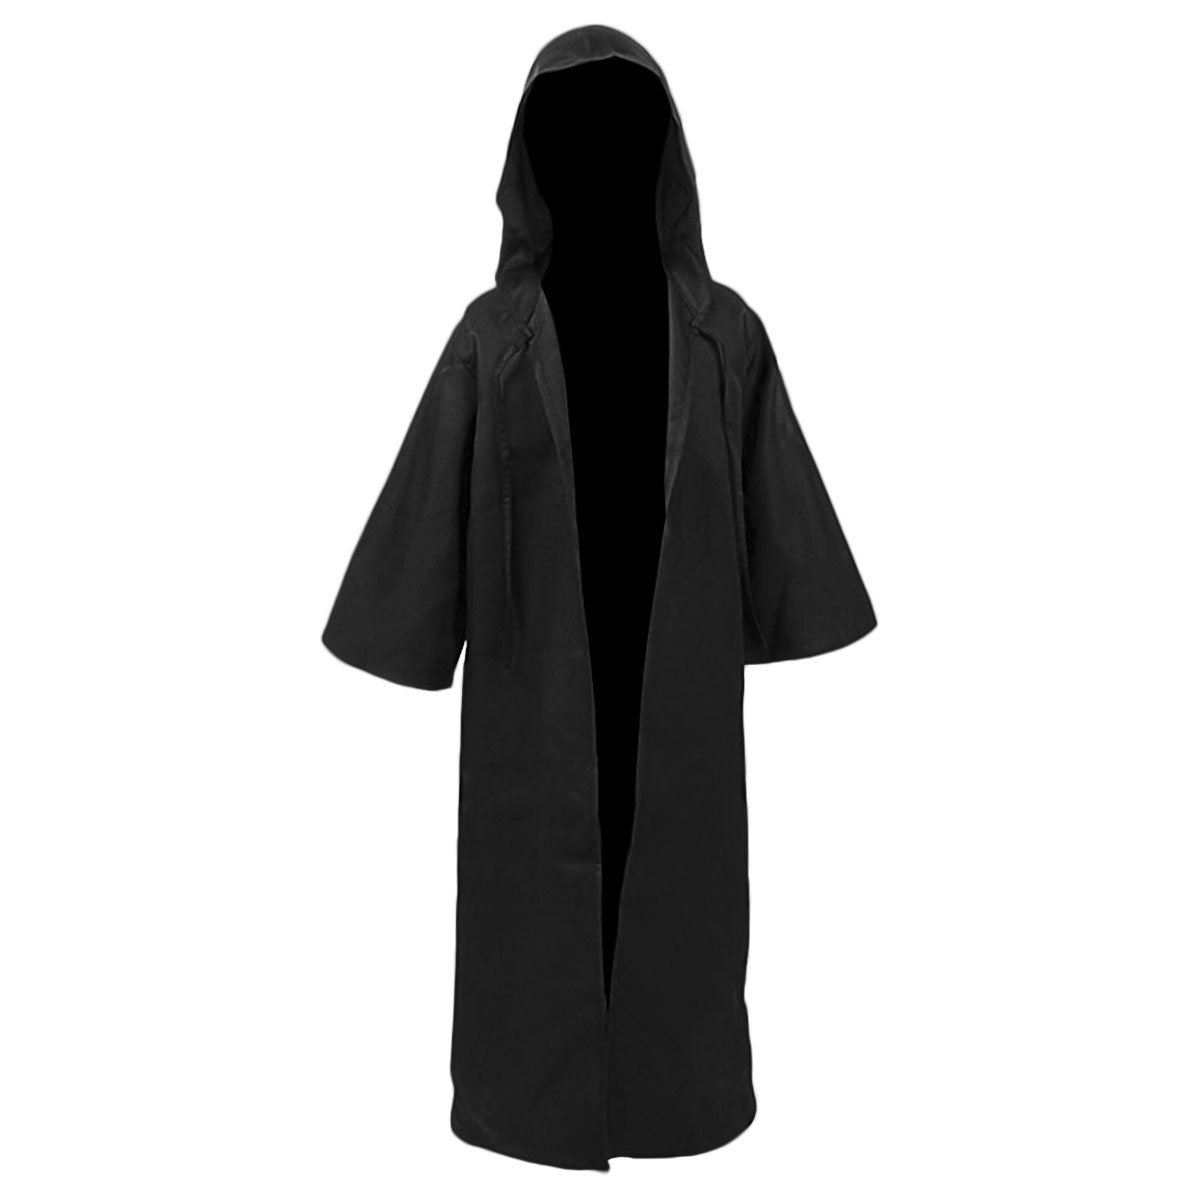 Kids Children Tunic Hooded Robe Cloak Knight Gothic Fancy Dress Halloween Masquerade Cosplay Costume Cape